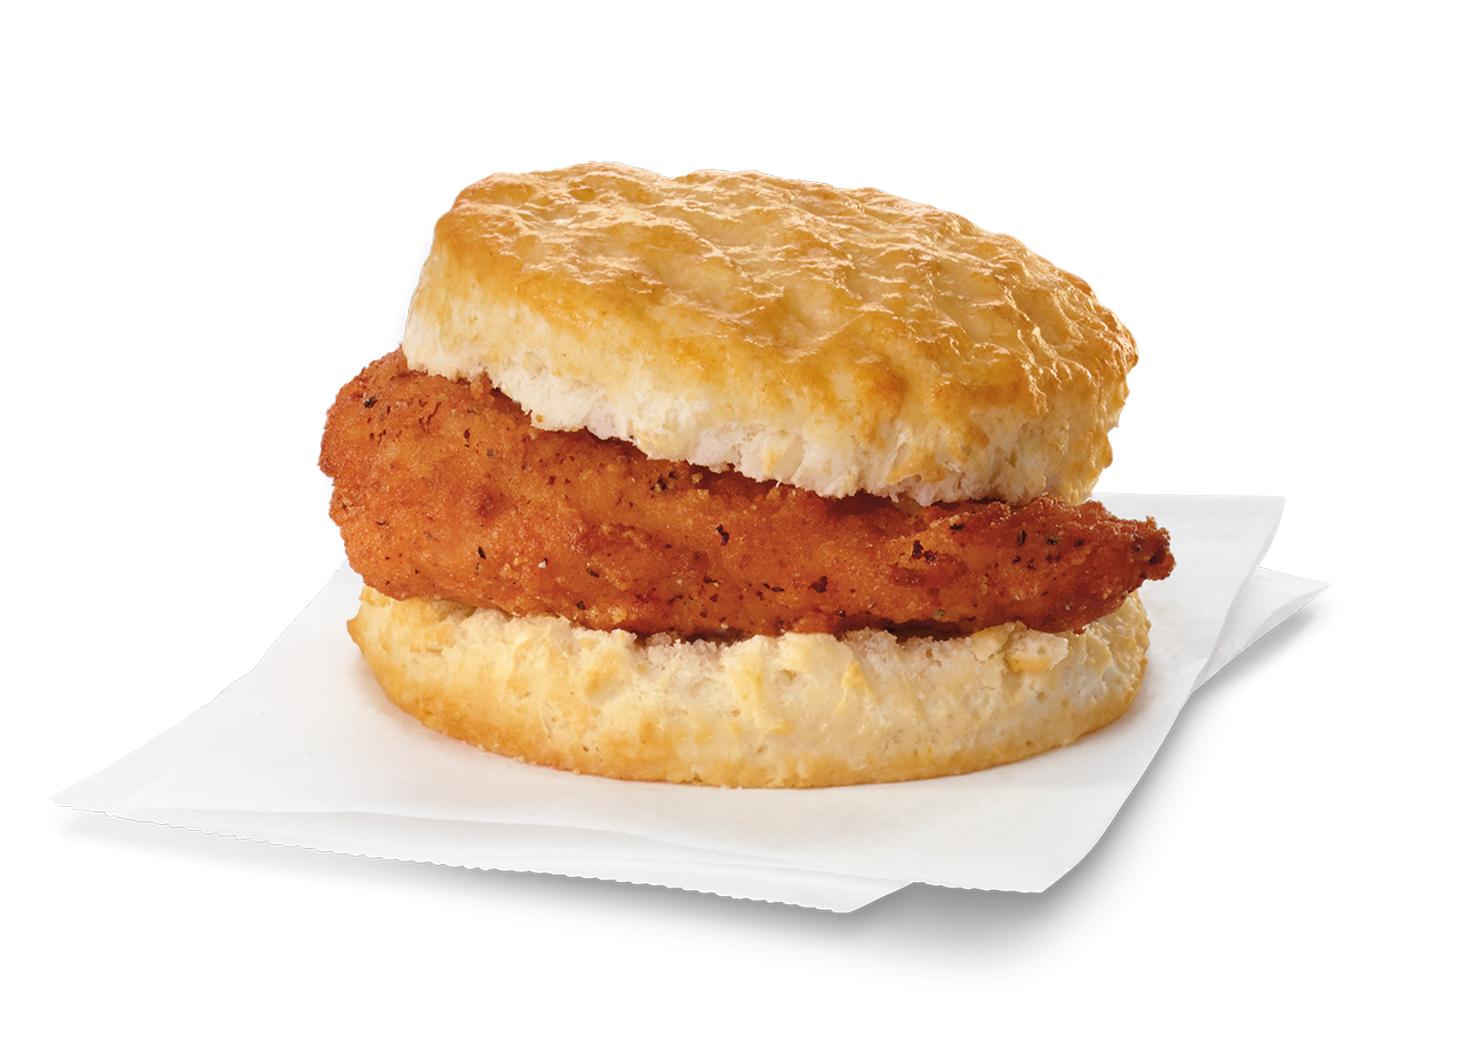 Chick fil A - Home of the Original Chicken Sandwich ...